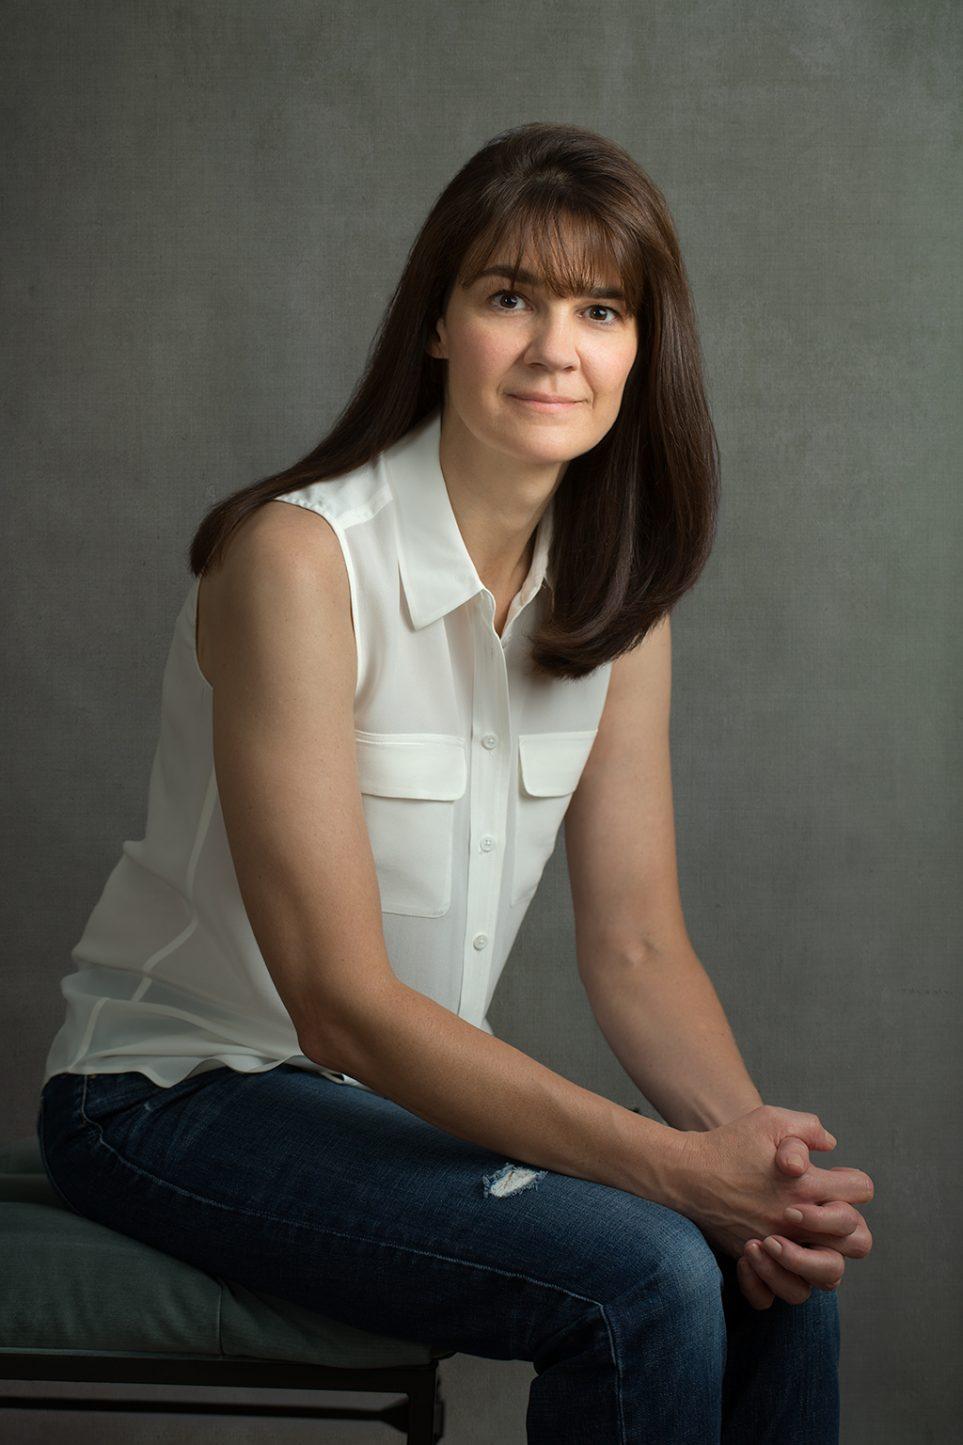 Female Portrait Gray Background Digitally Enhanced Fine Art